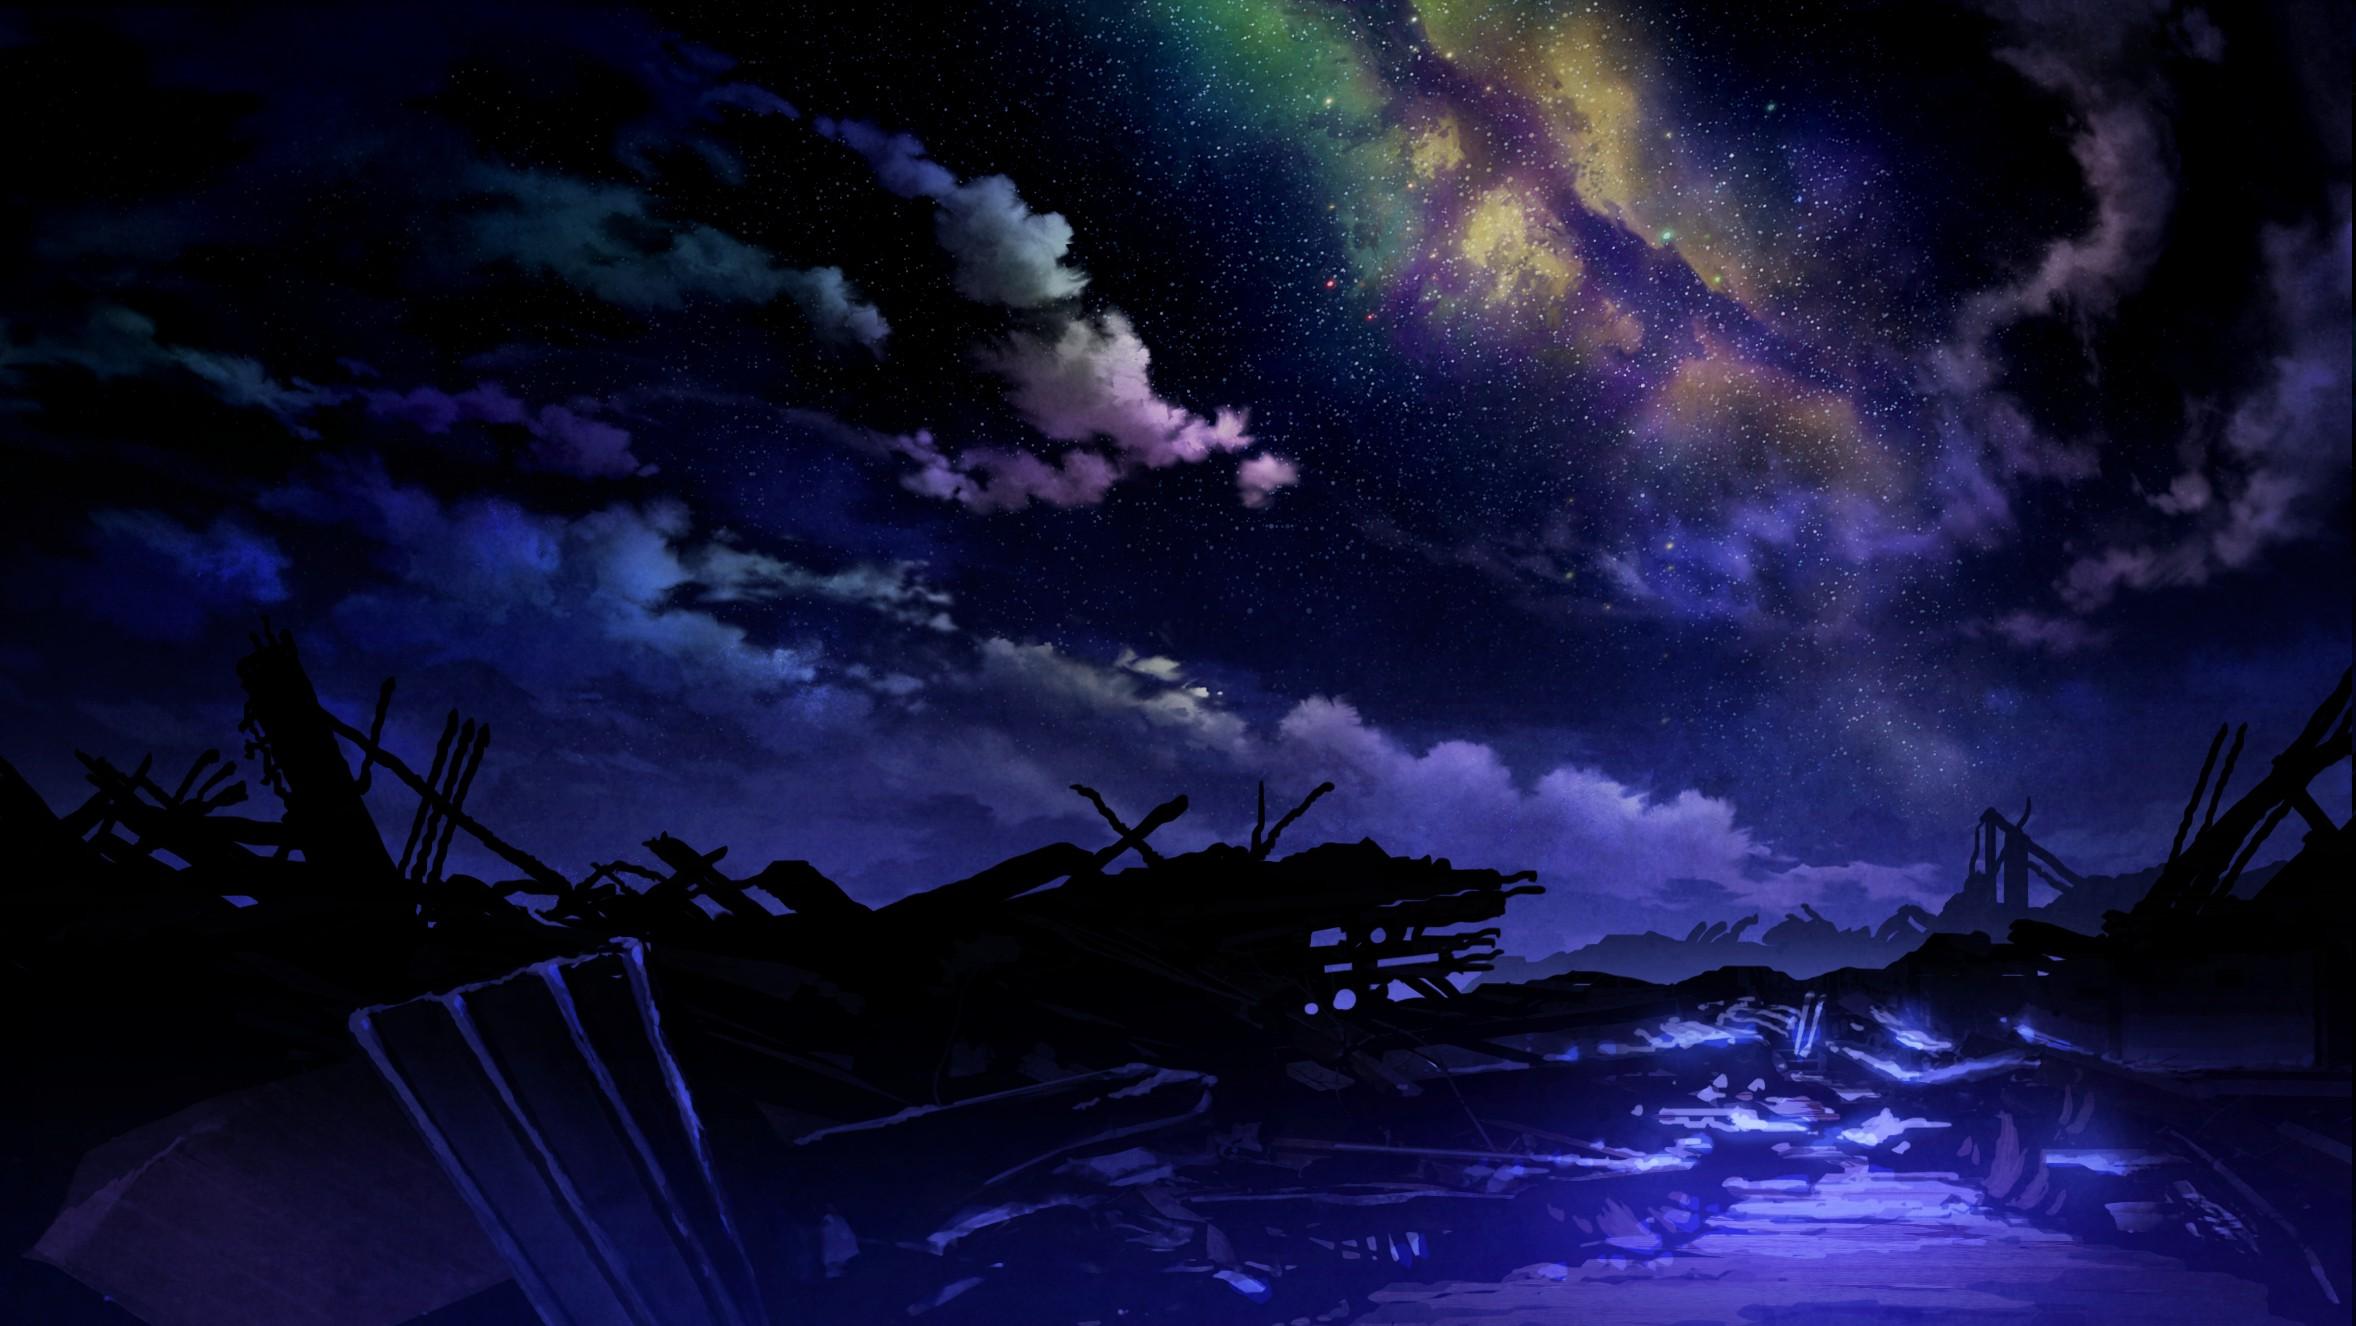 Wallpaper : Fantasy Art, Night, Anime, Nature, Apocalyptic